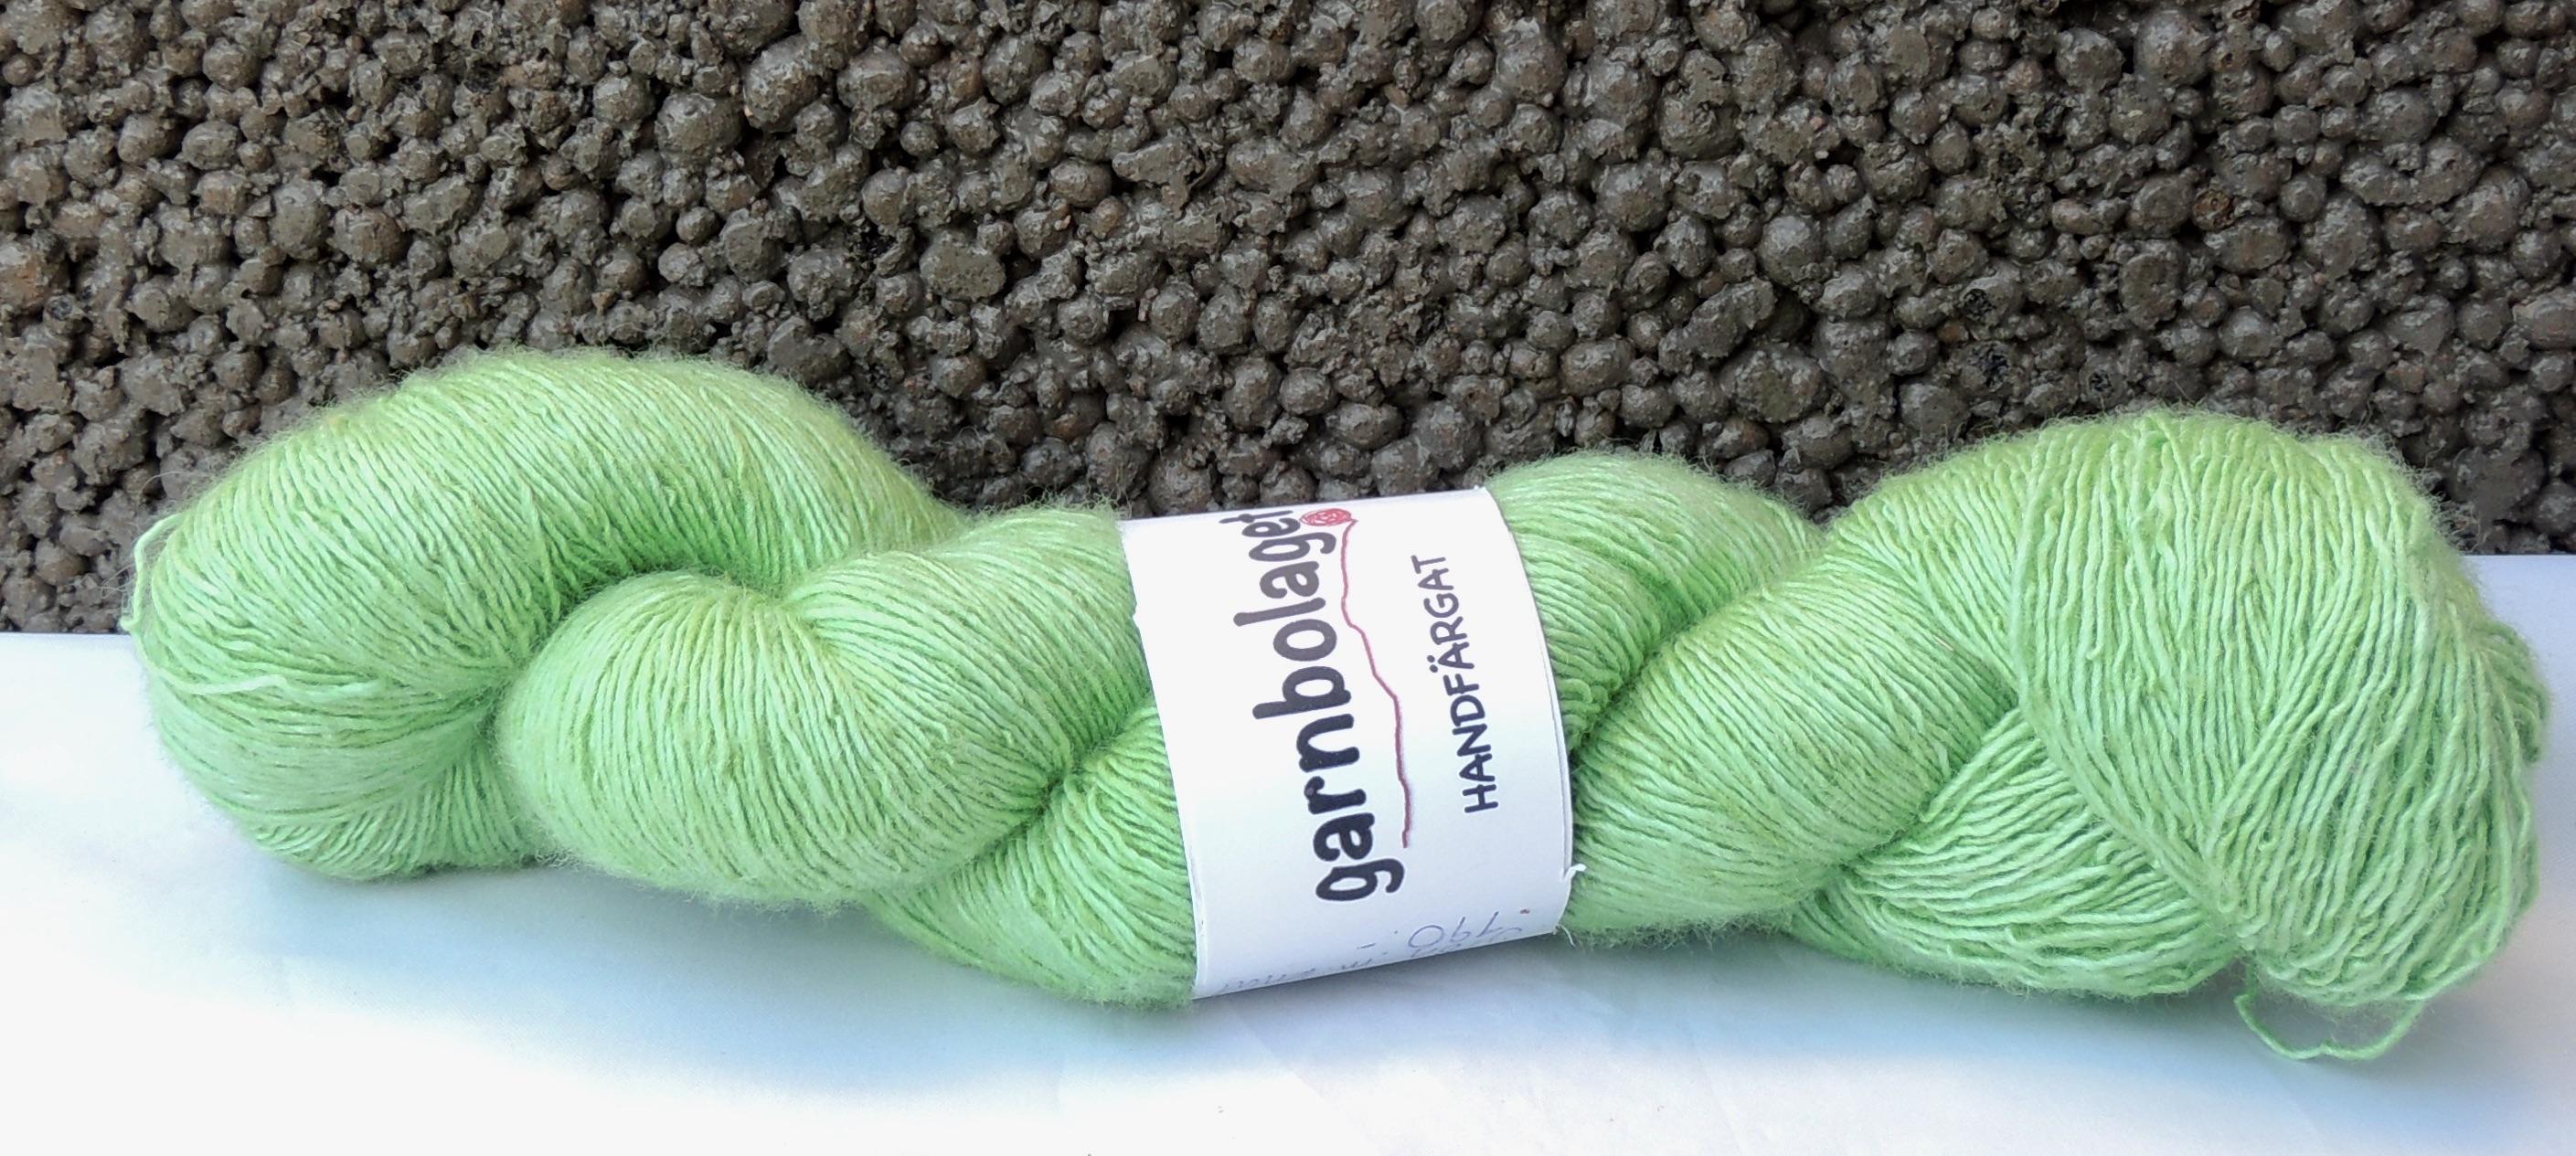 Lindblomsgrön m knut